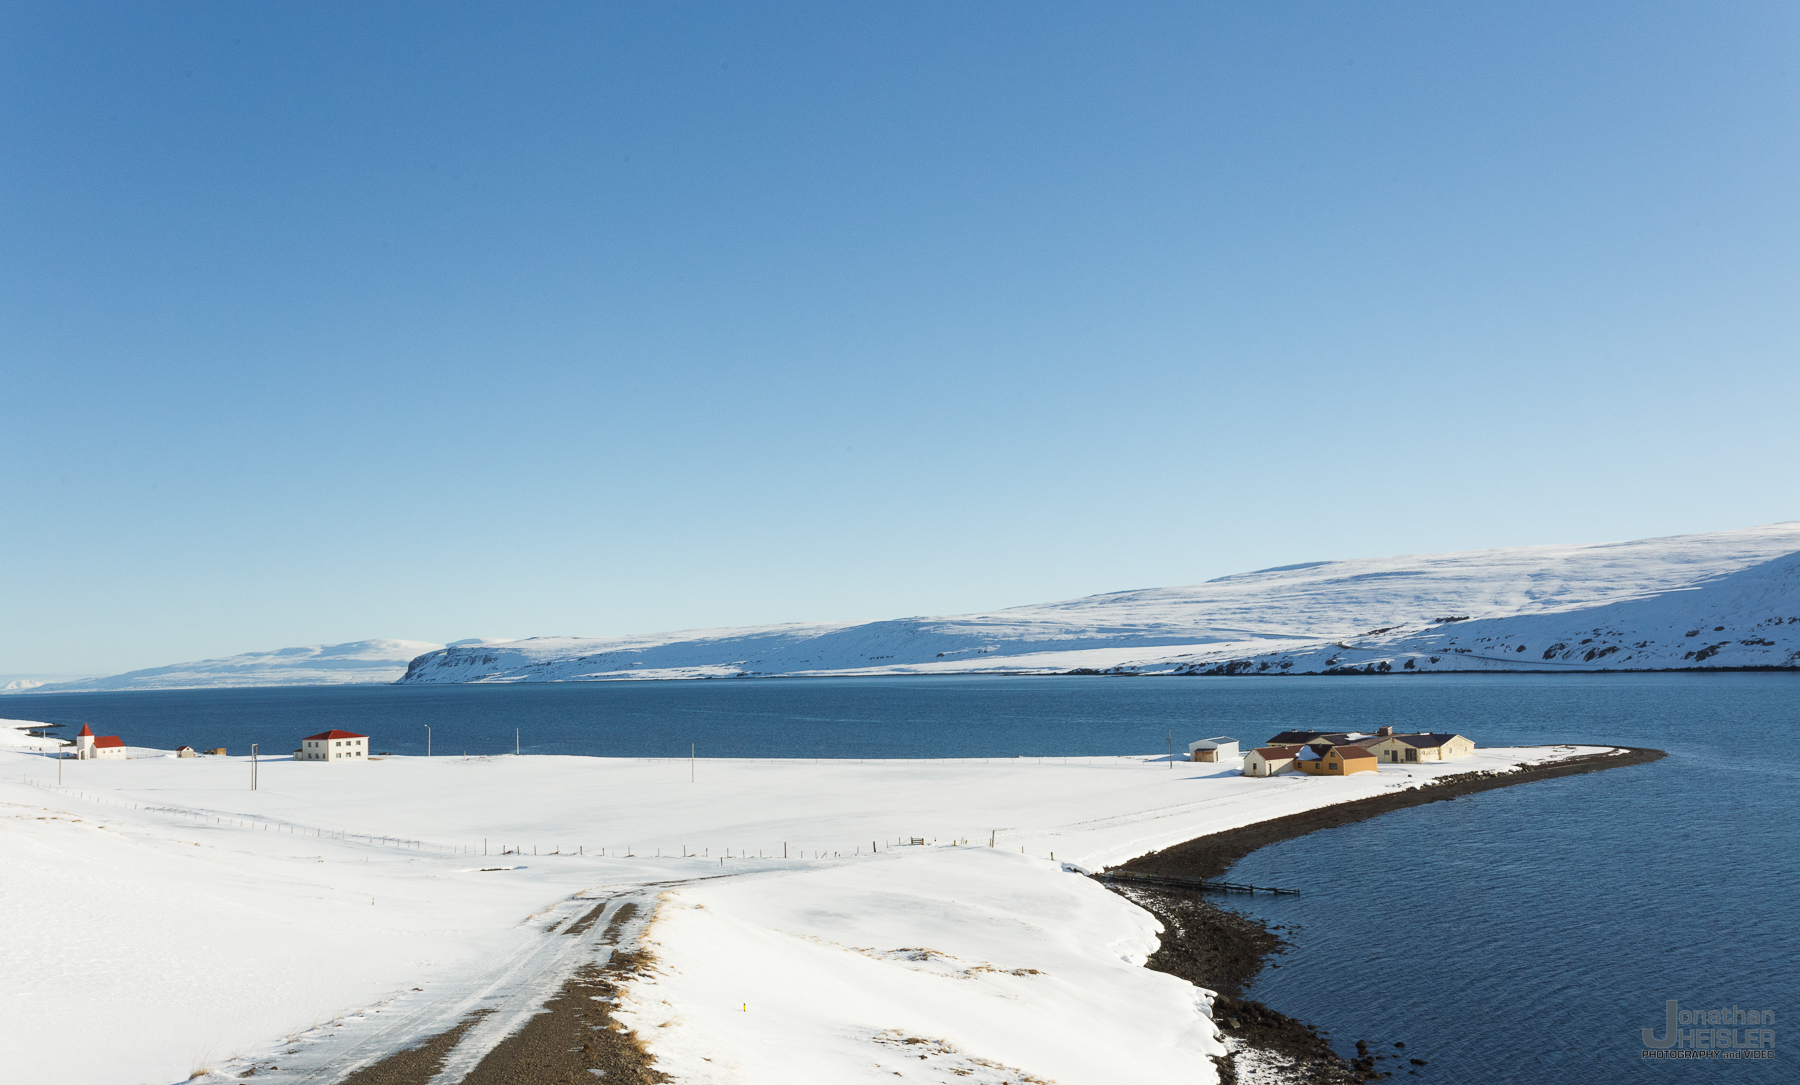 Iceland Winter Photos_  Jonathan Heisler __  02292016 _ 062.jpg